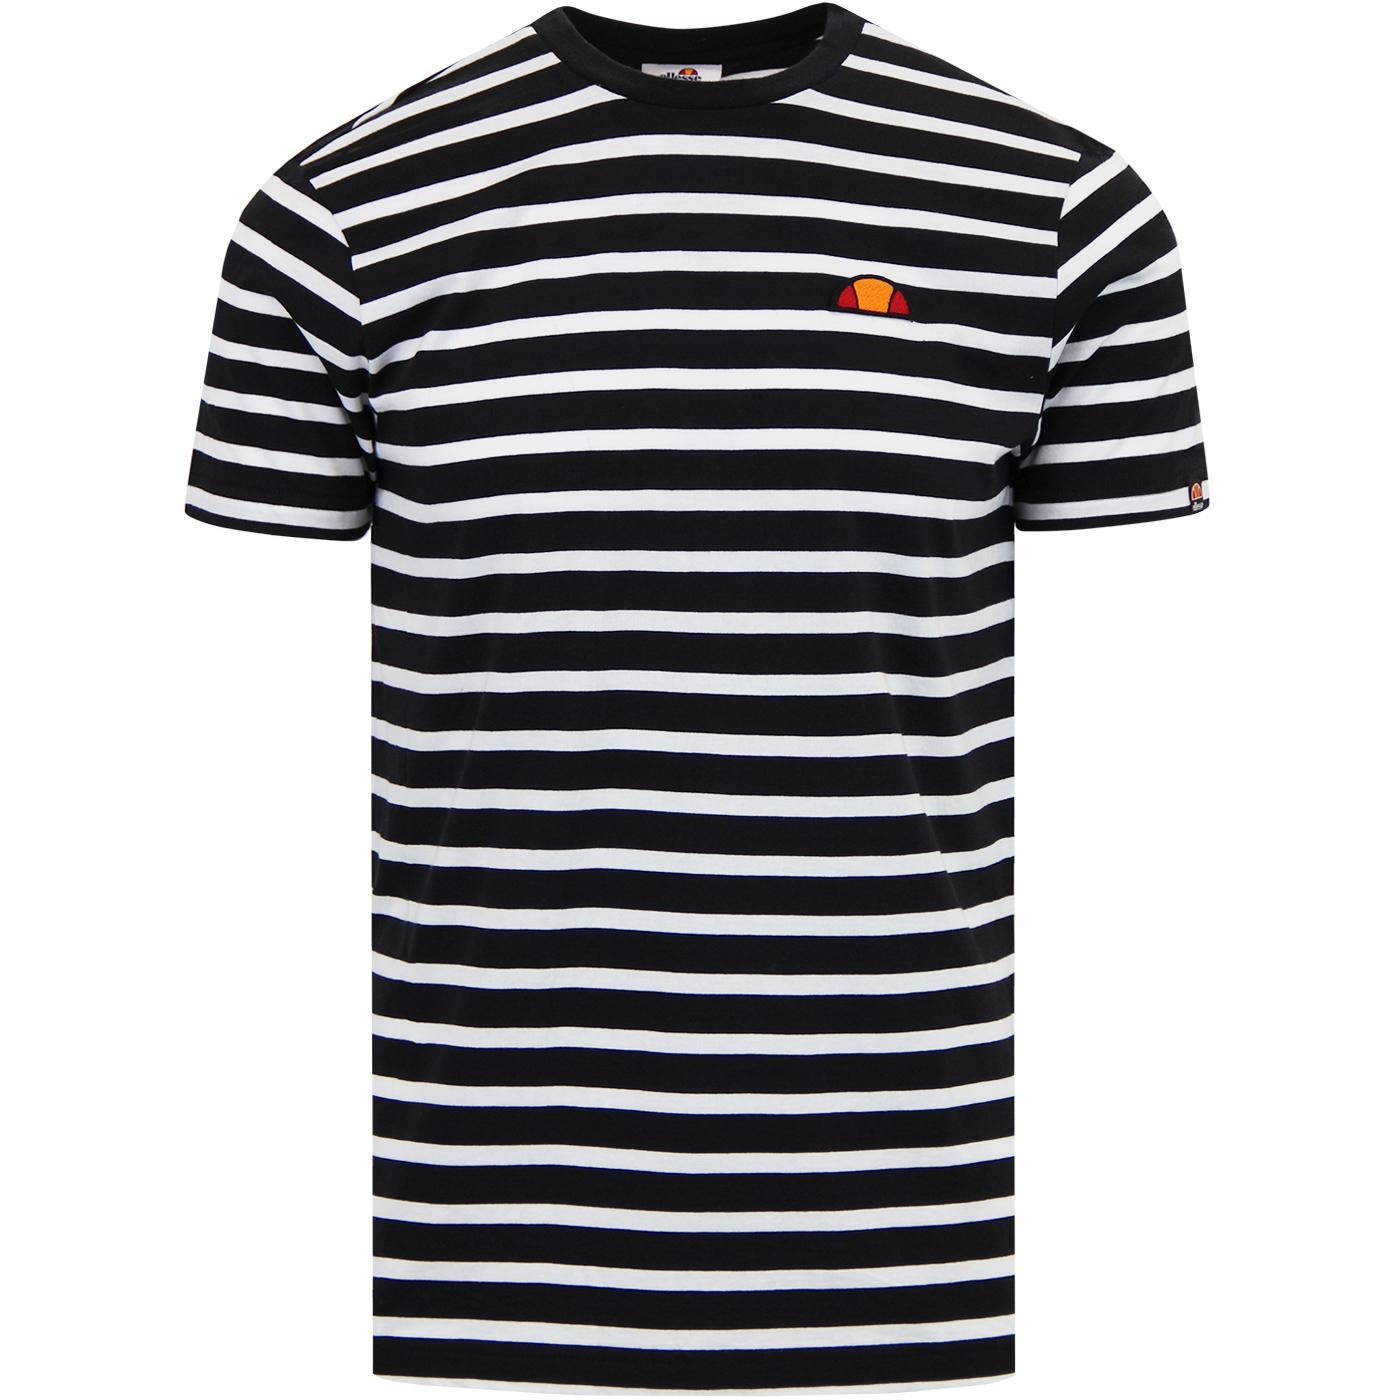 Sailo ELLESSE Mens Retro Breton Stripe T-Shirt B